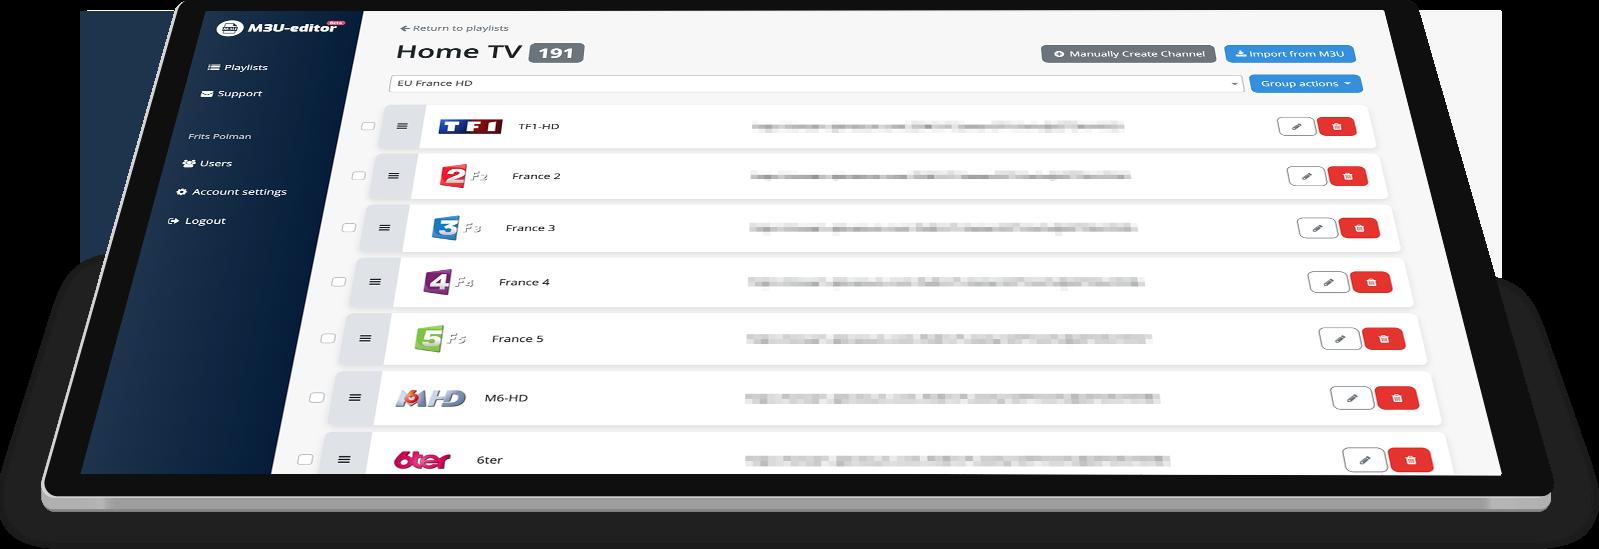 M3U-editor   Edit your M3U playlists online, for free!